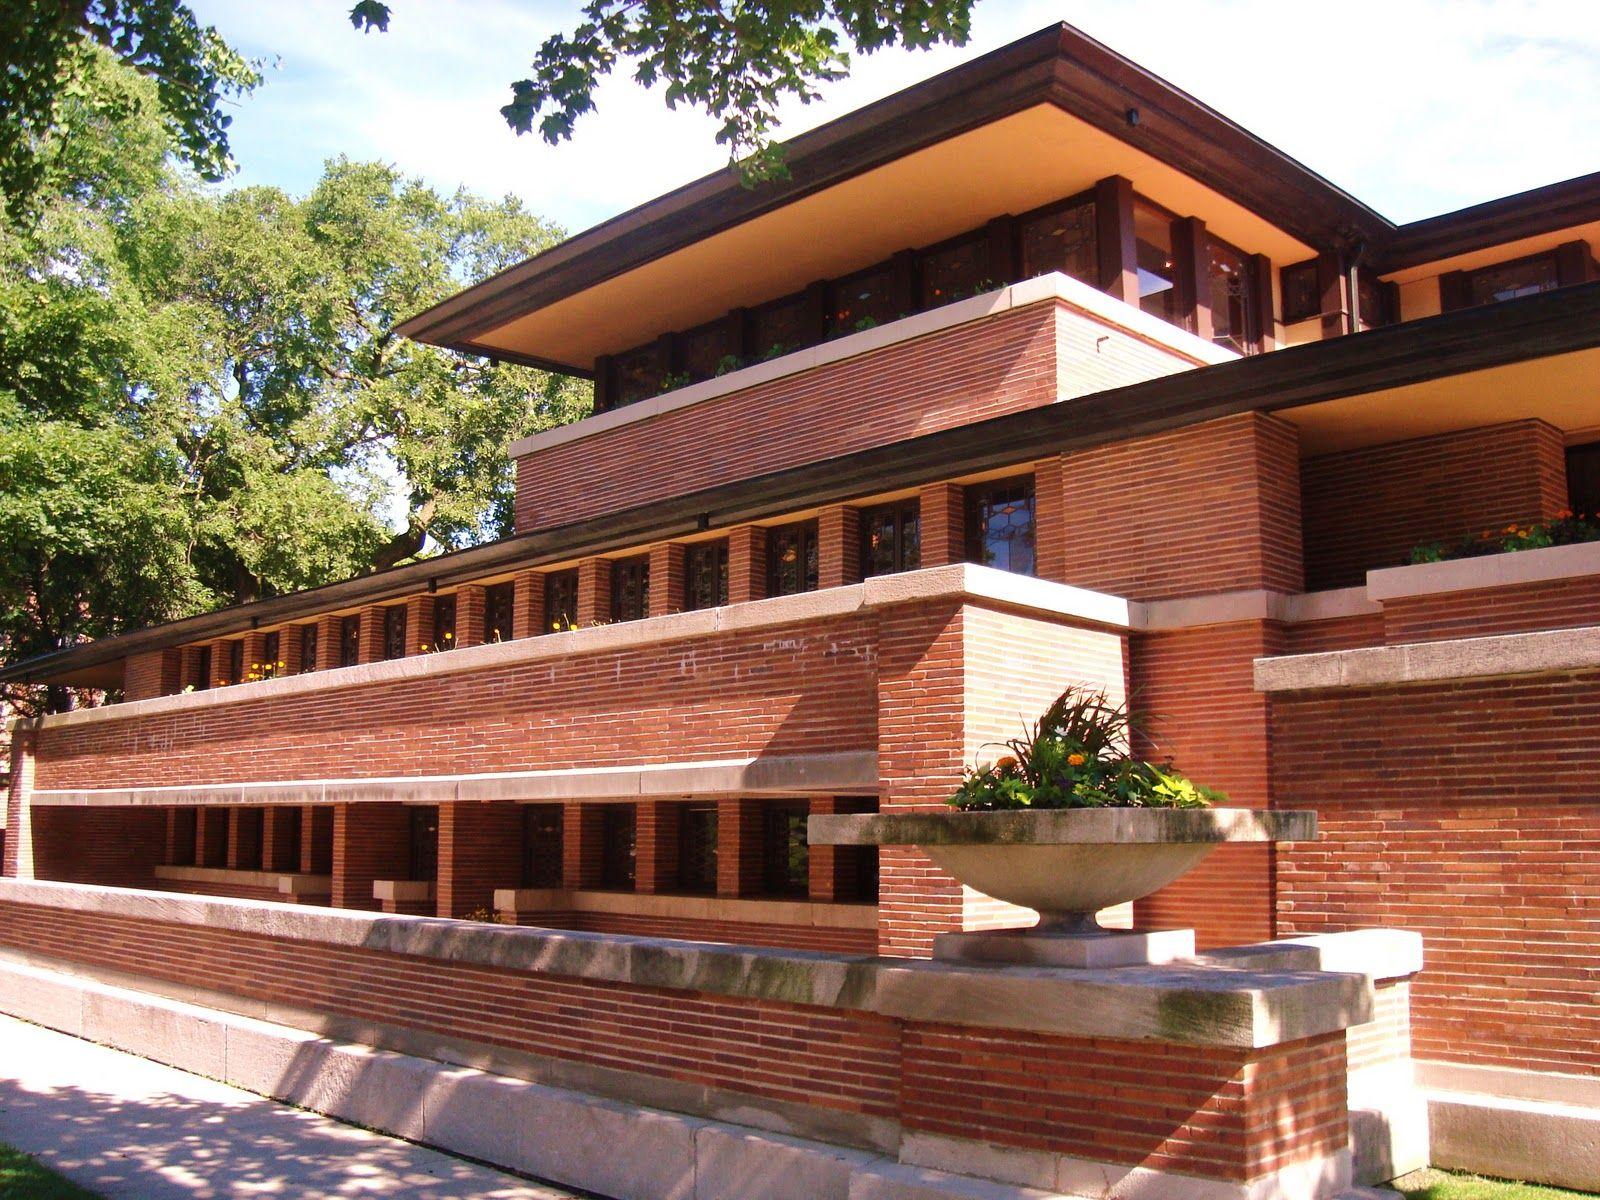 Robie house chicago il usa 1910 architect frank lloyd wright